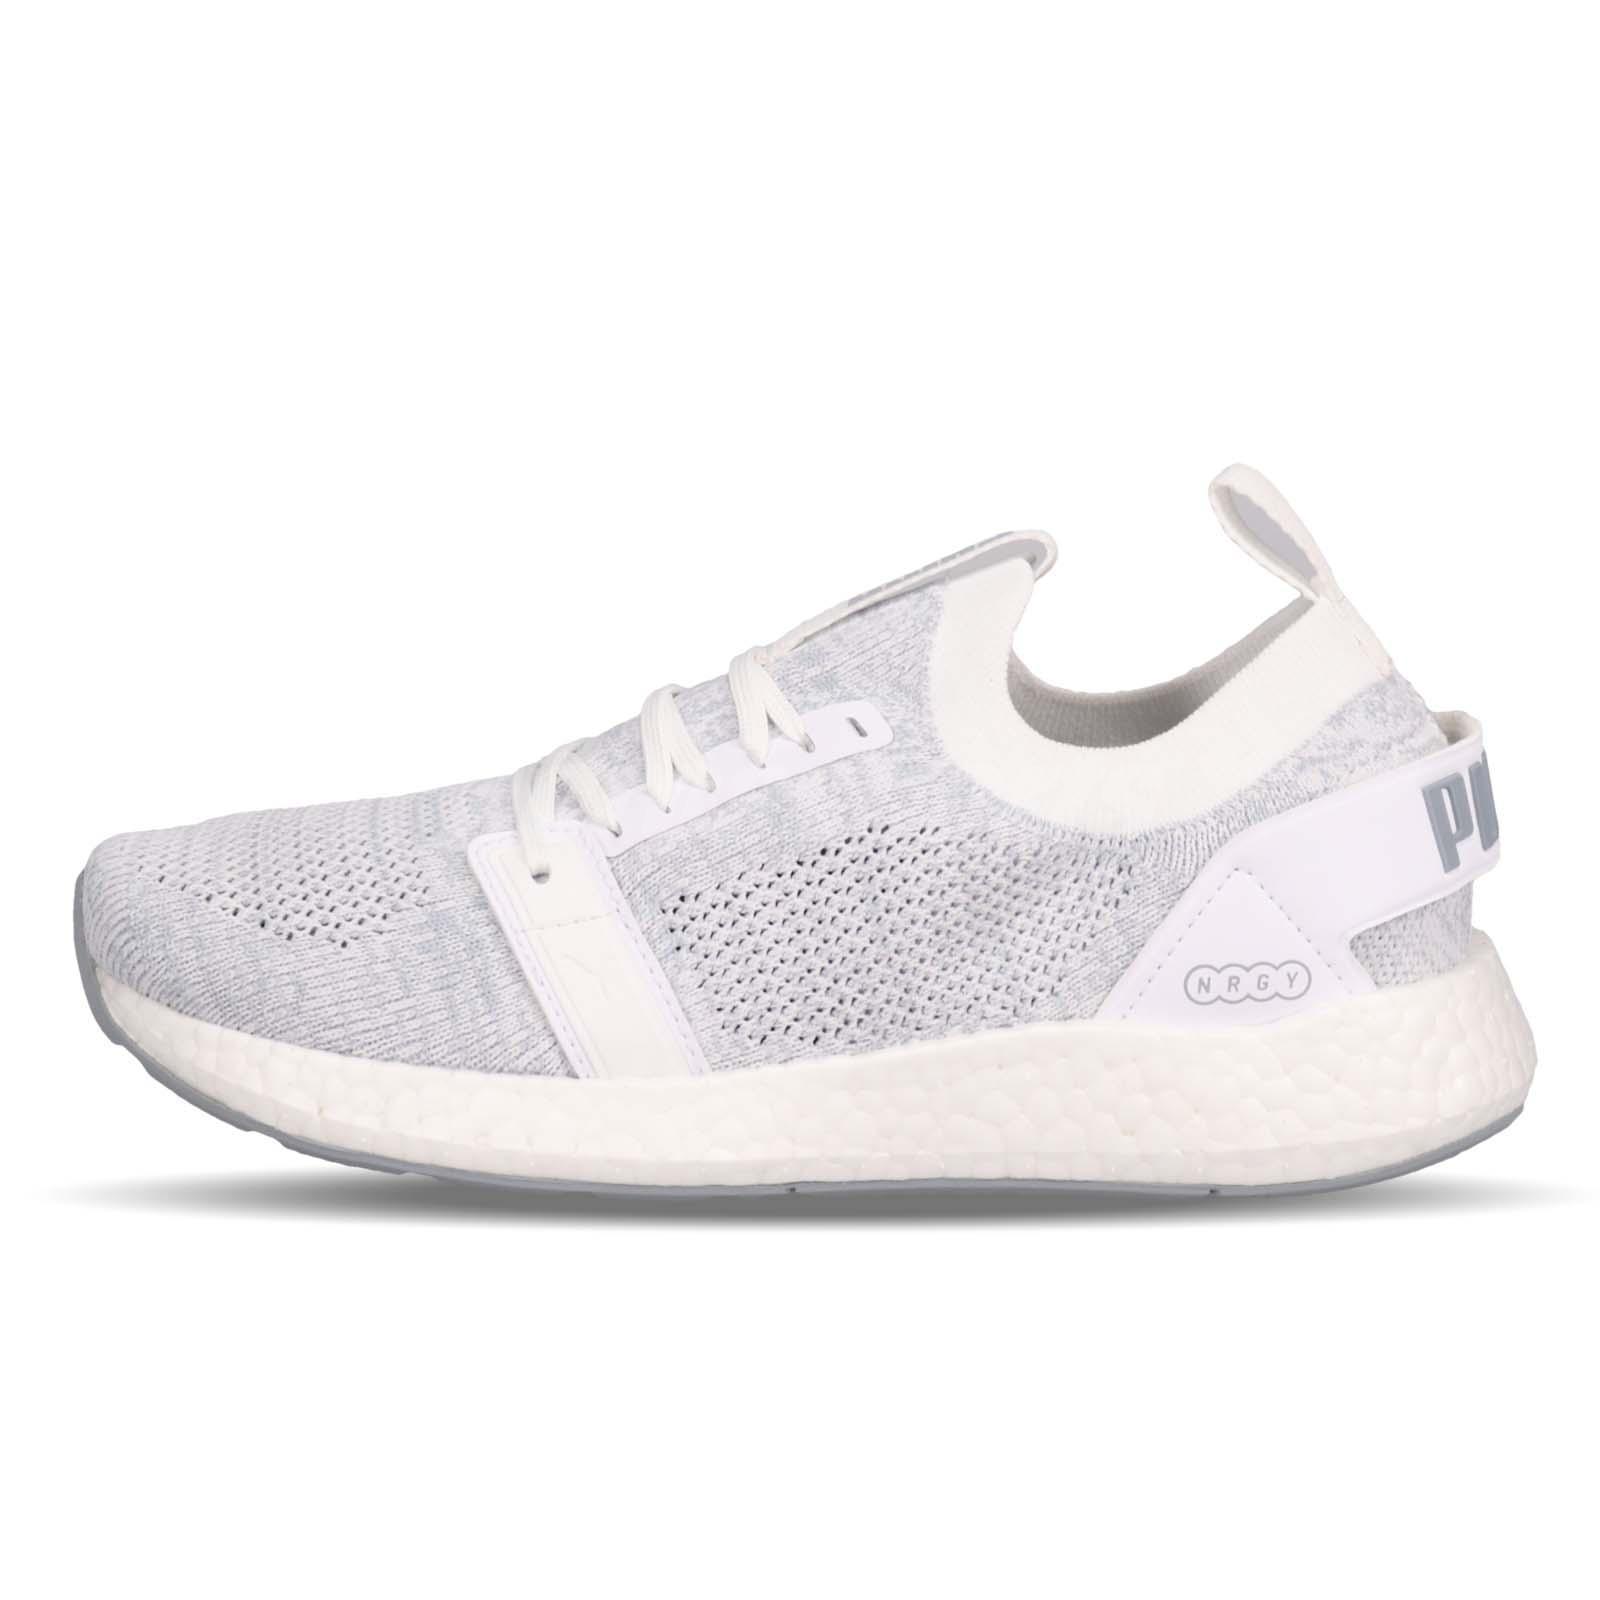 58b16d37f65 Puma NRGY Neko Engineer Knit Wns White Quarry Women Running Shoes 191094-07